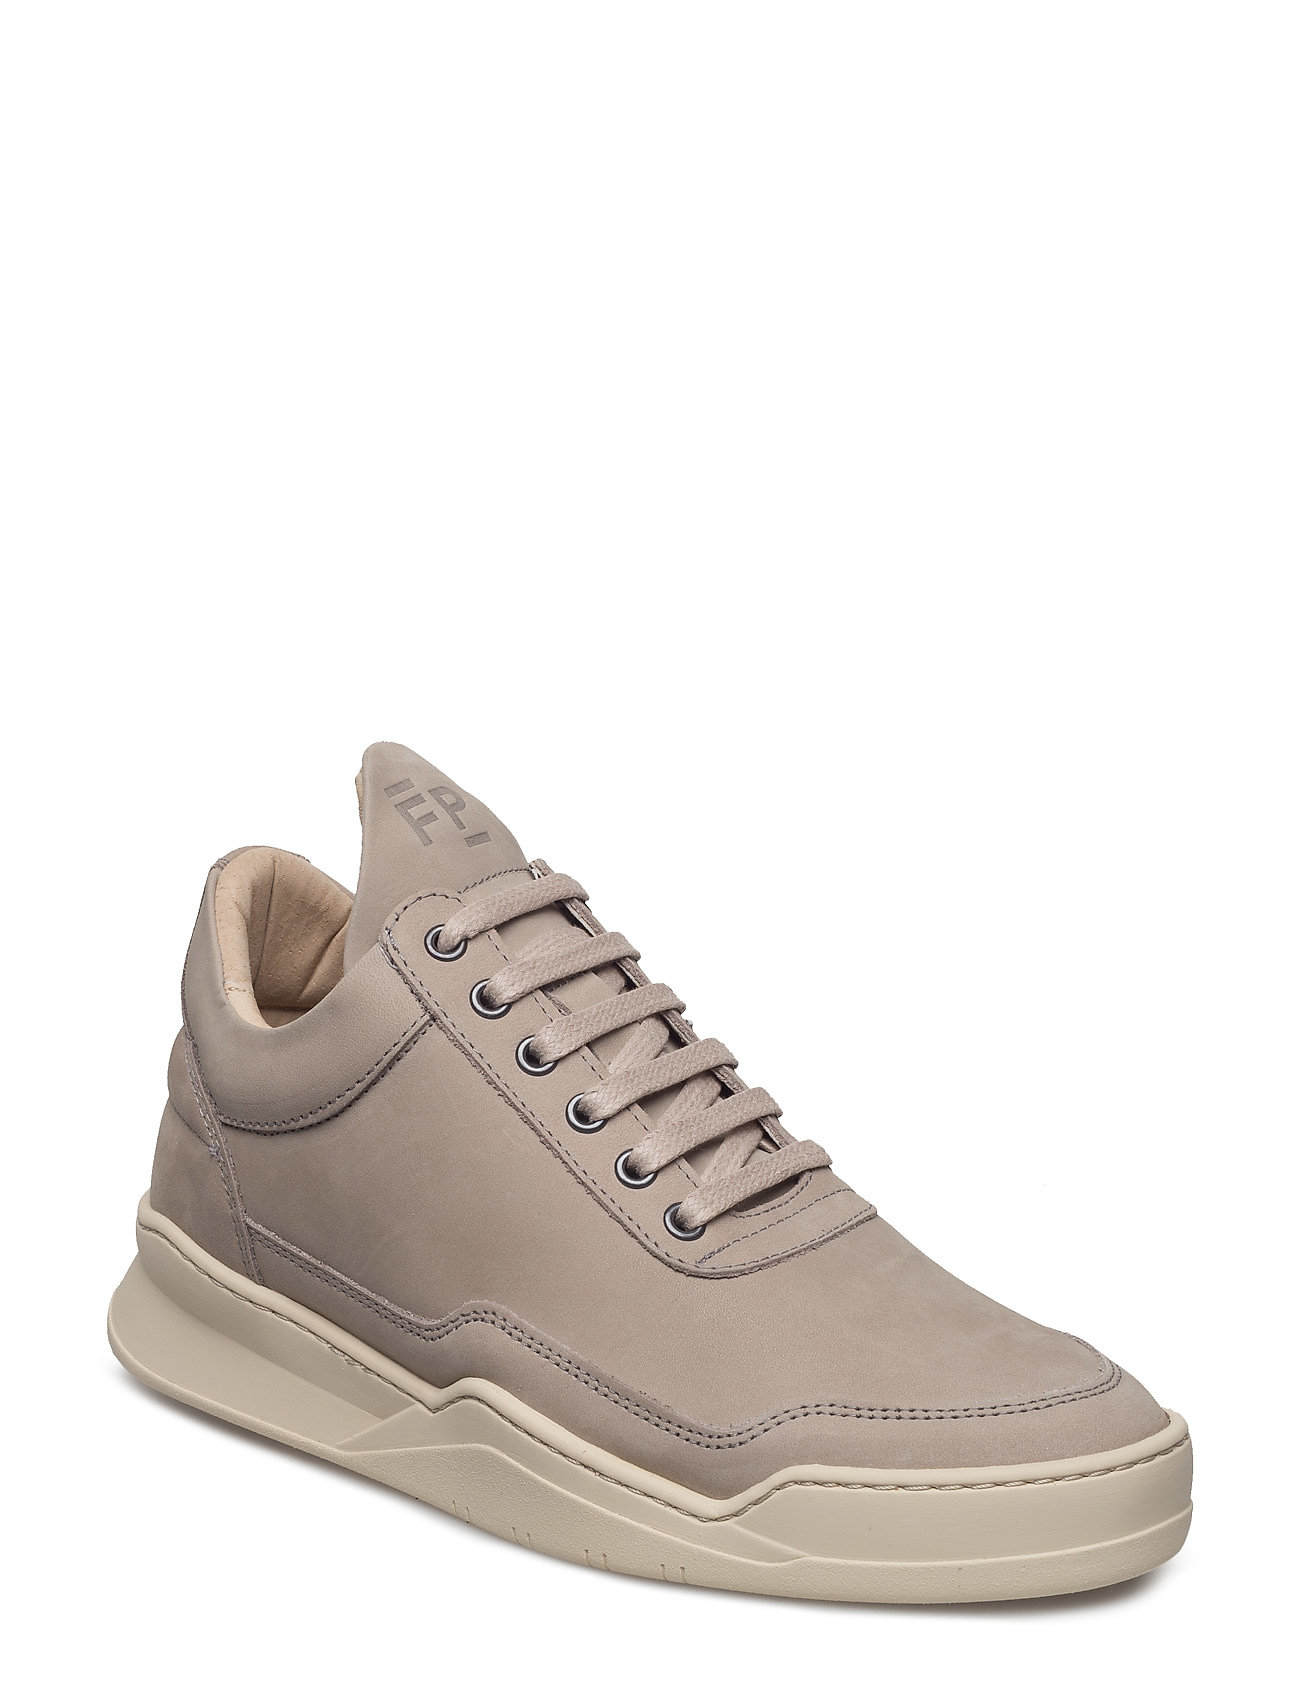 Low Top Ghost Lane Off White Filling Pieces Sneakers til Damer i hvid